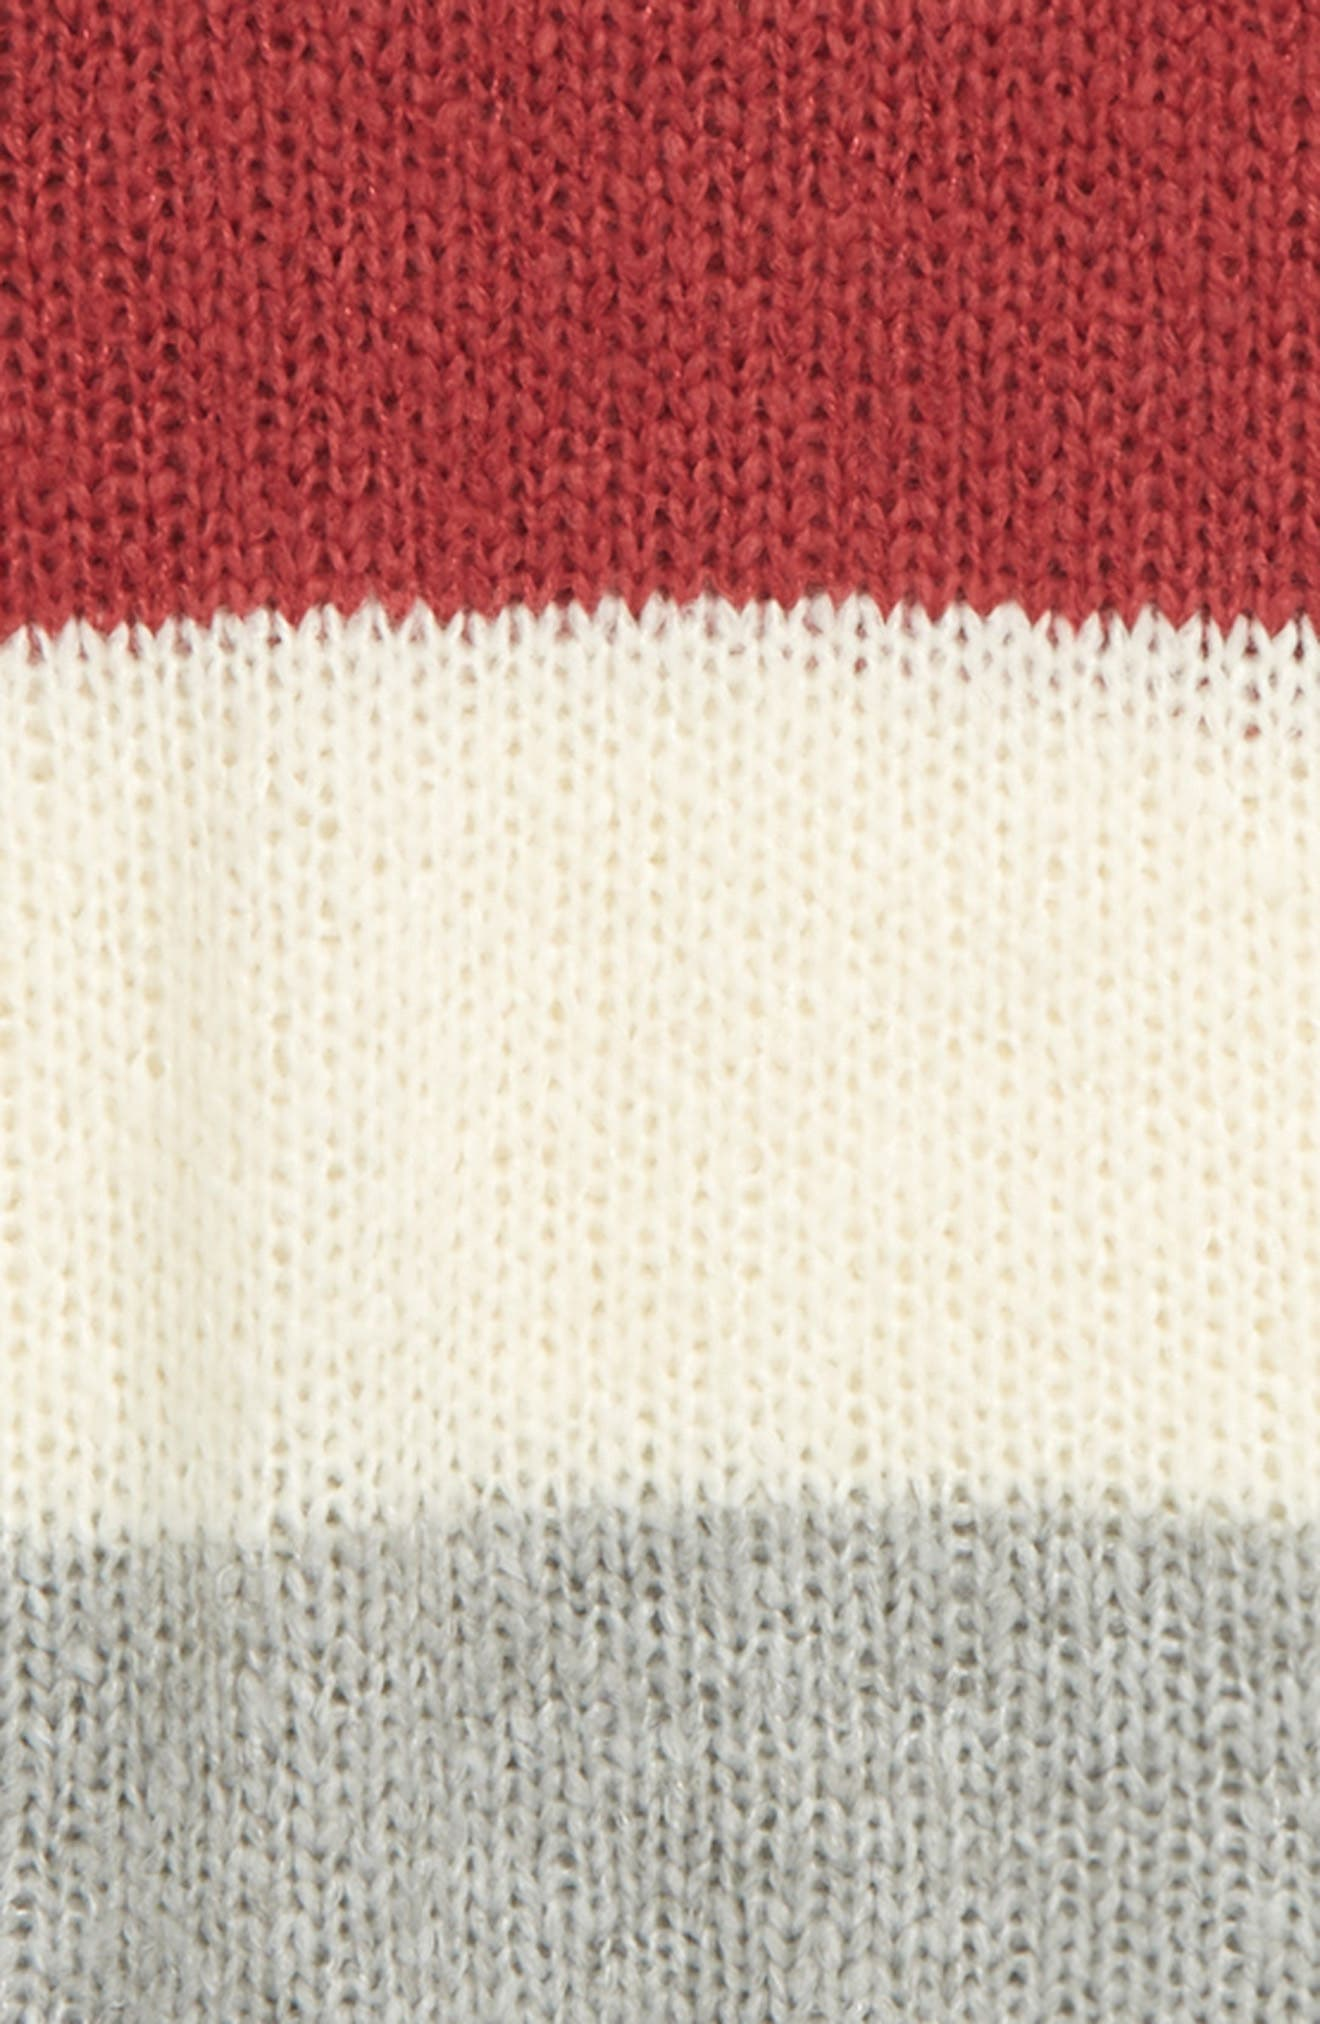 Colorblock Sweater,                             Alternate thumbnail 2, color,                             PINK PEACHSKIN MULTI STRIPE